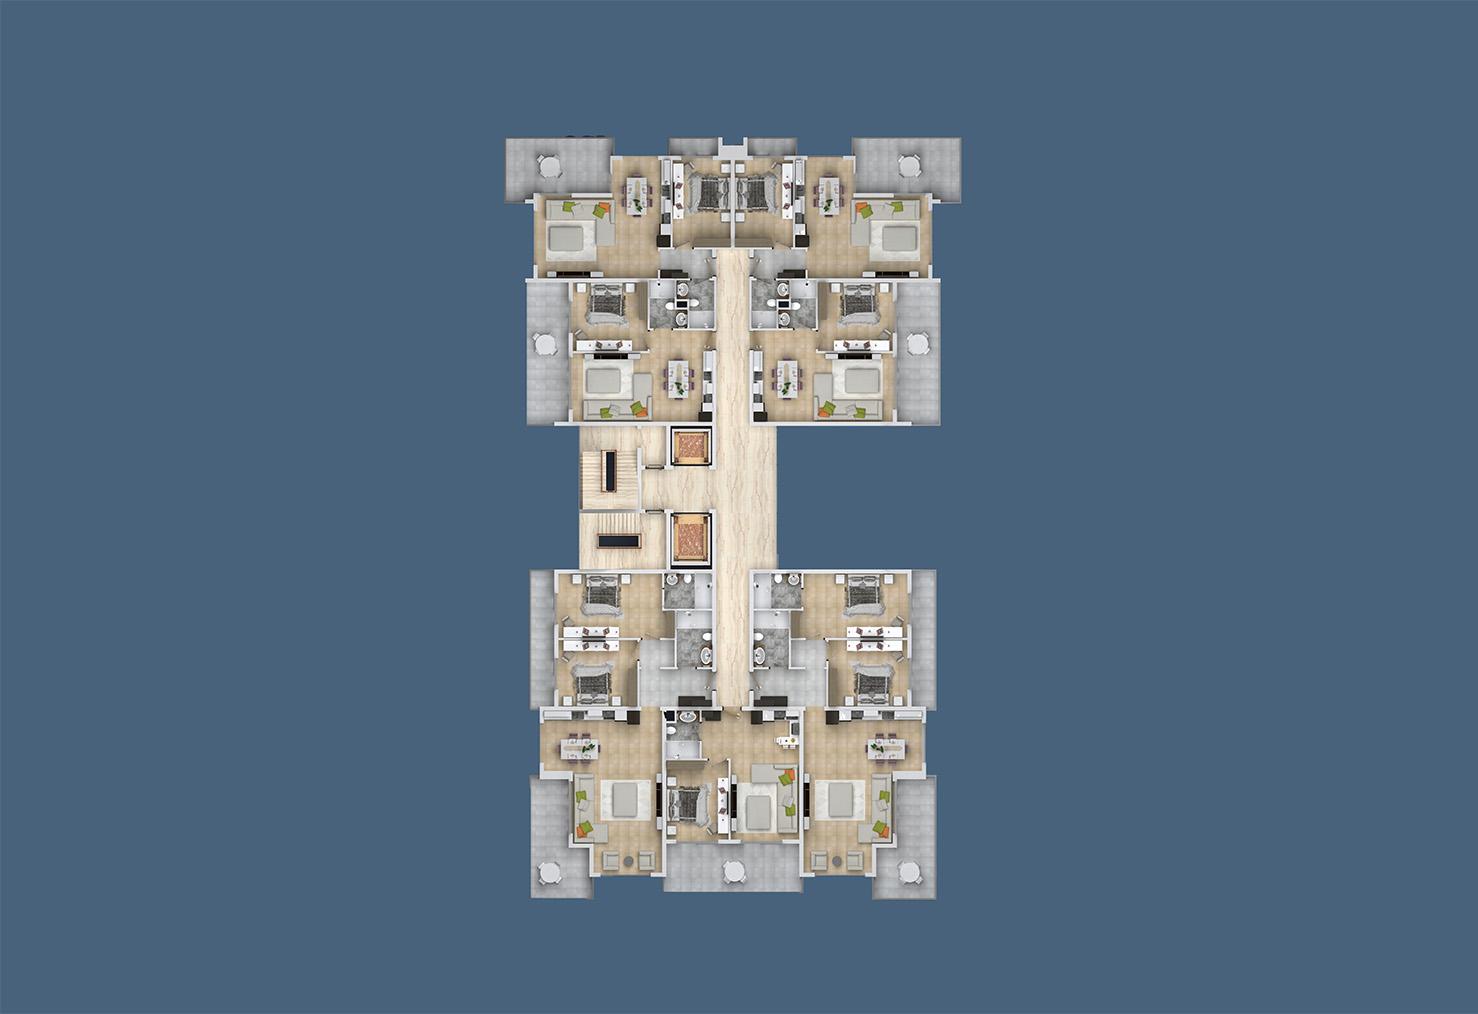 Floor plans of apartments 7 floor «D» Yekta Kingdom Trade Center